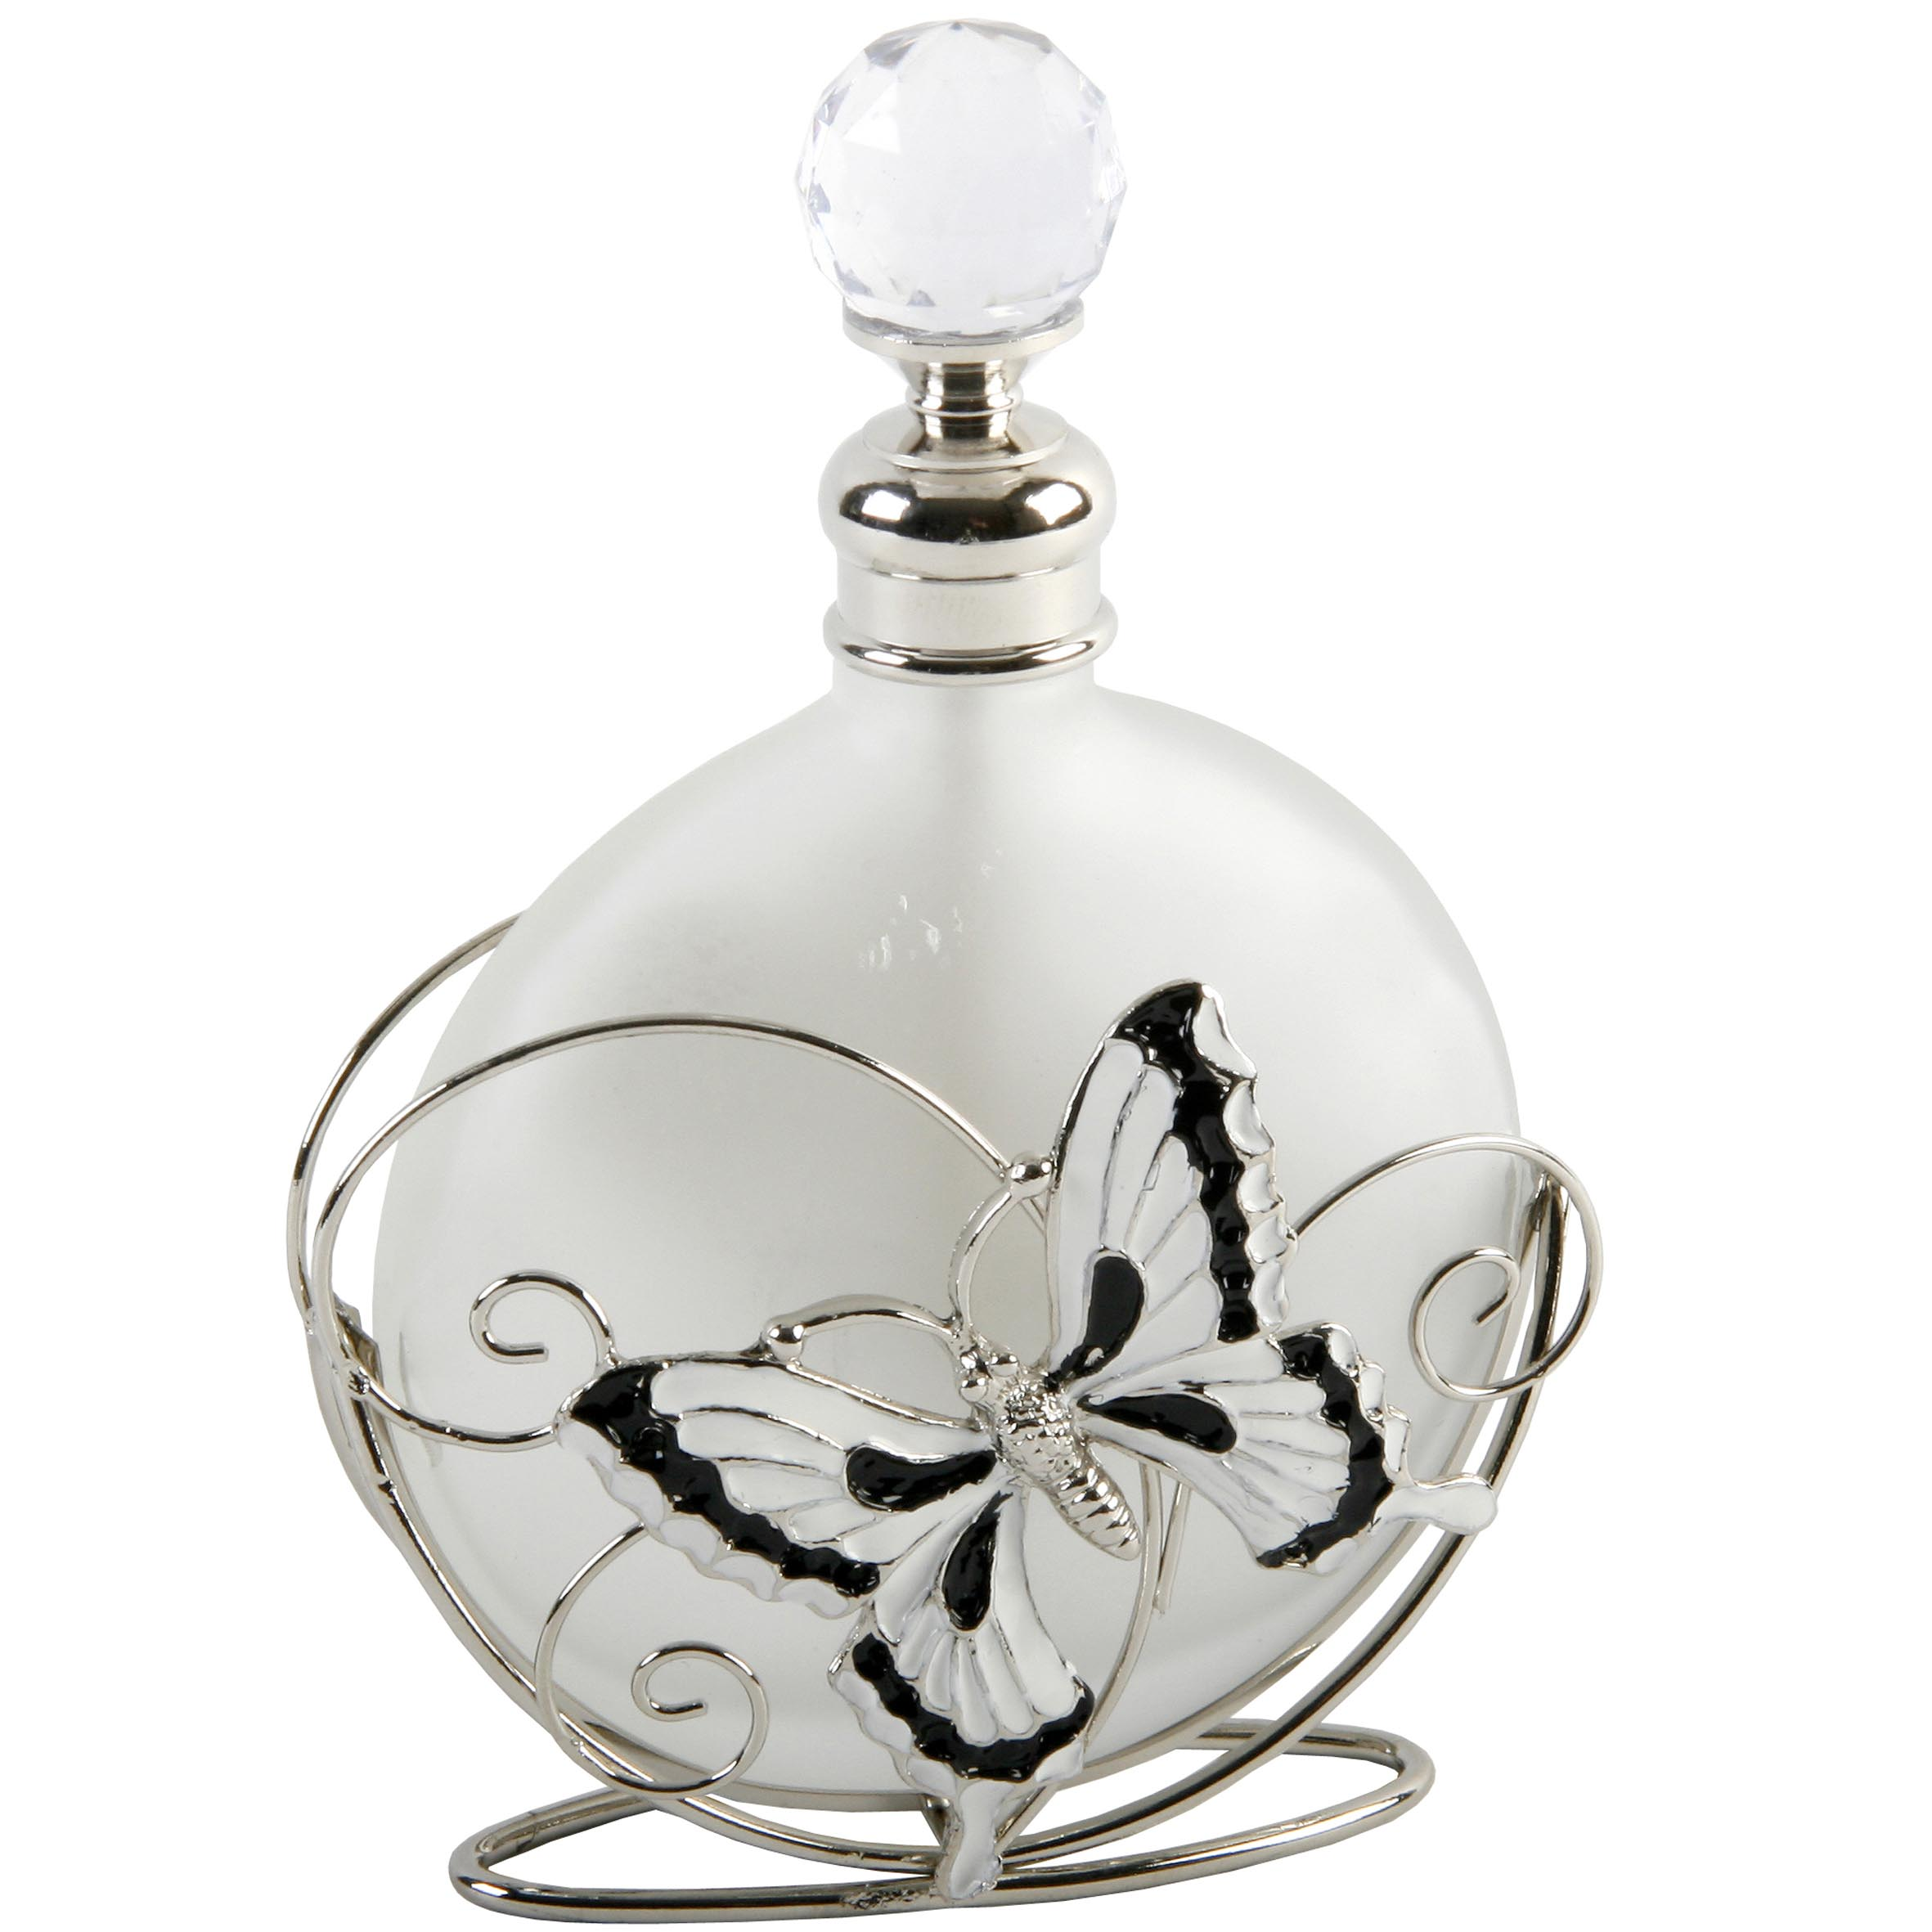 Bottle of perfume photo